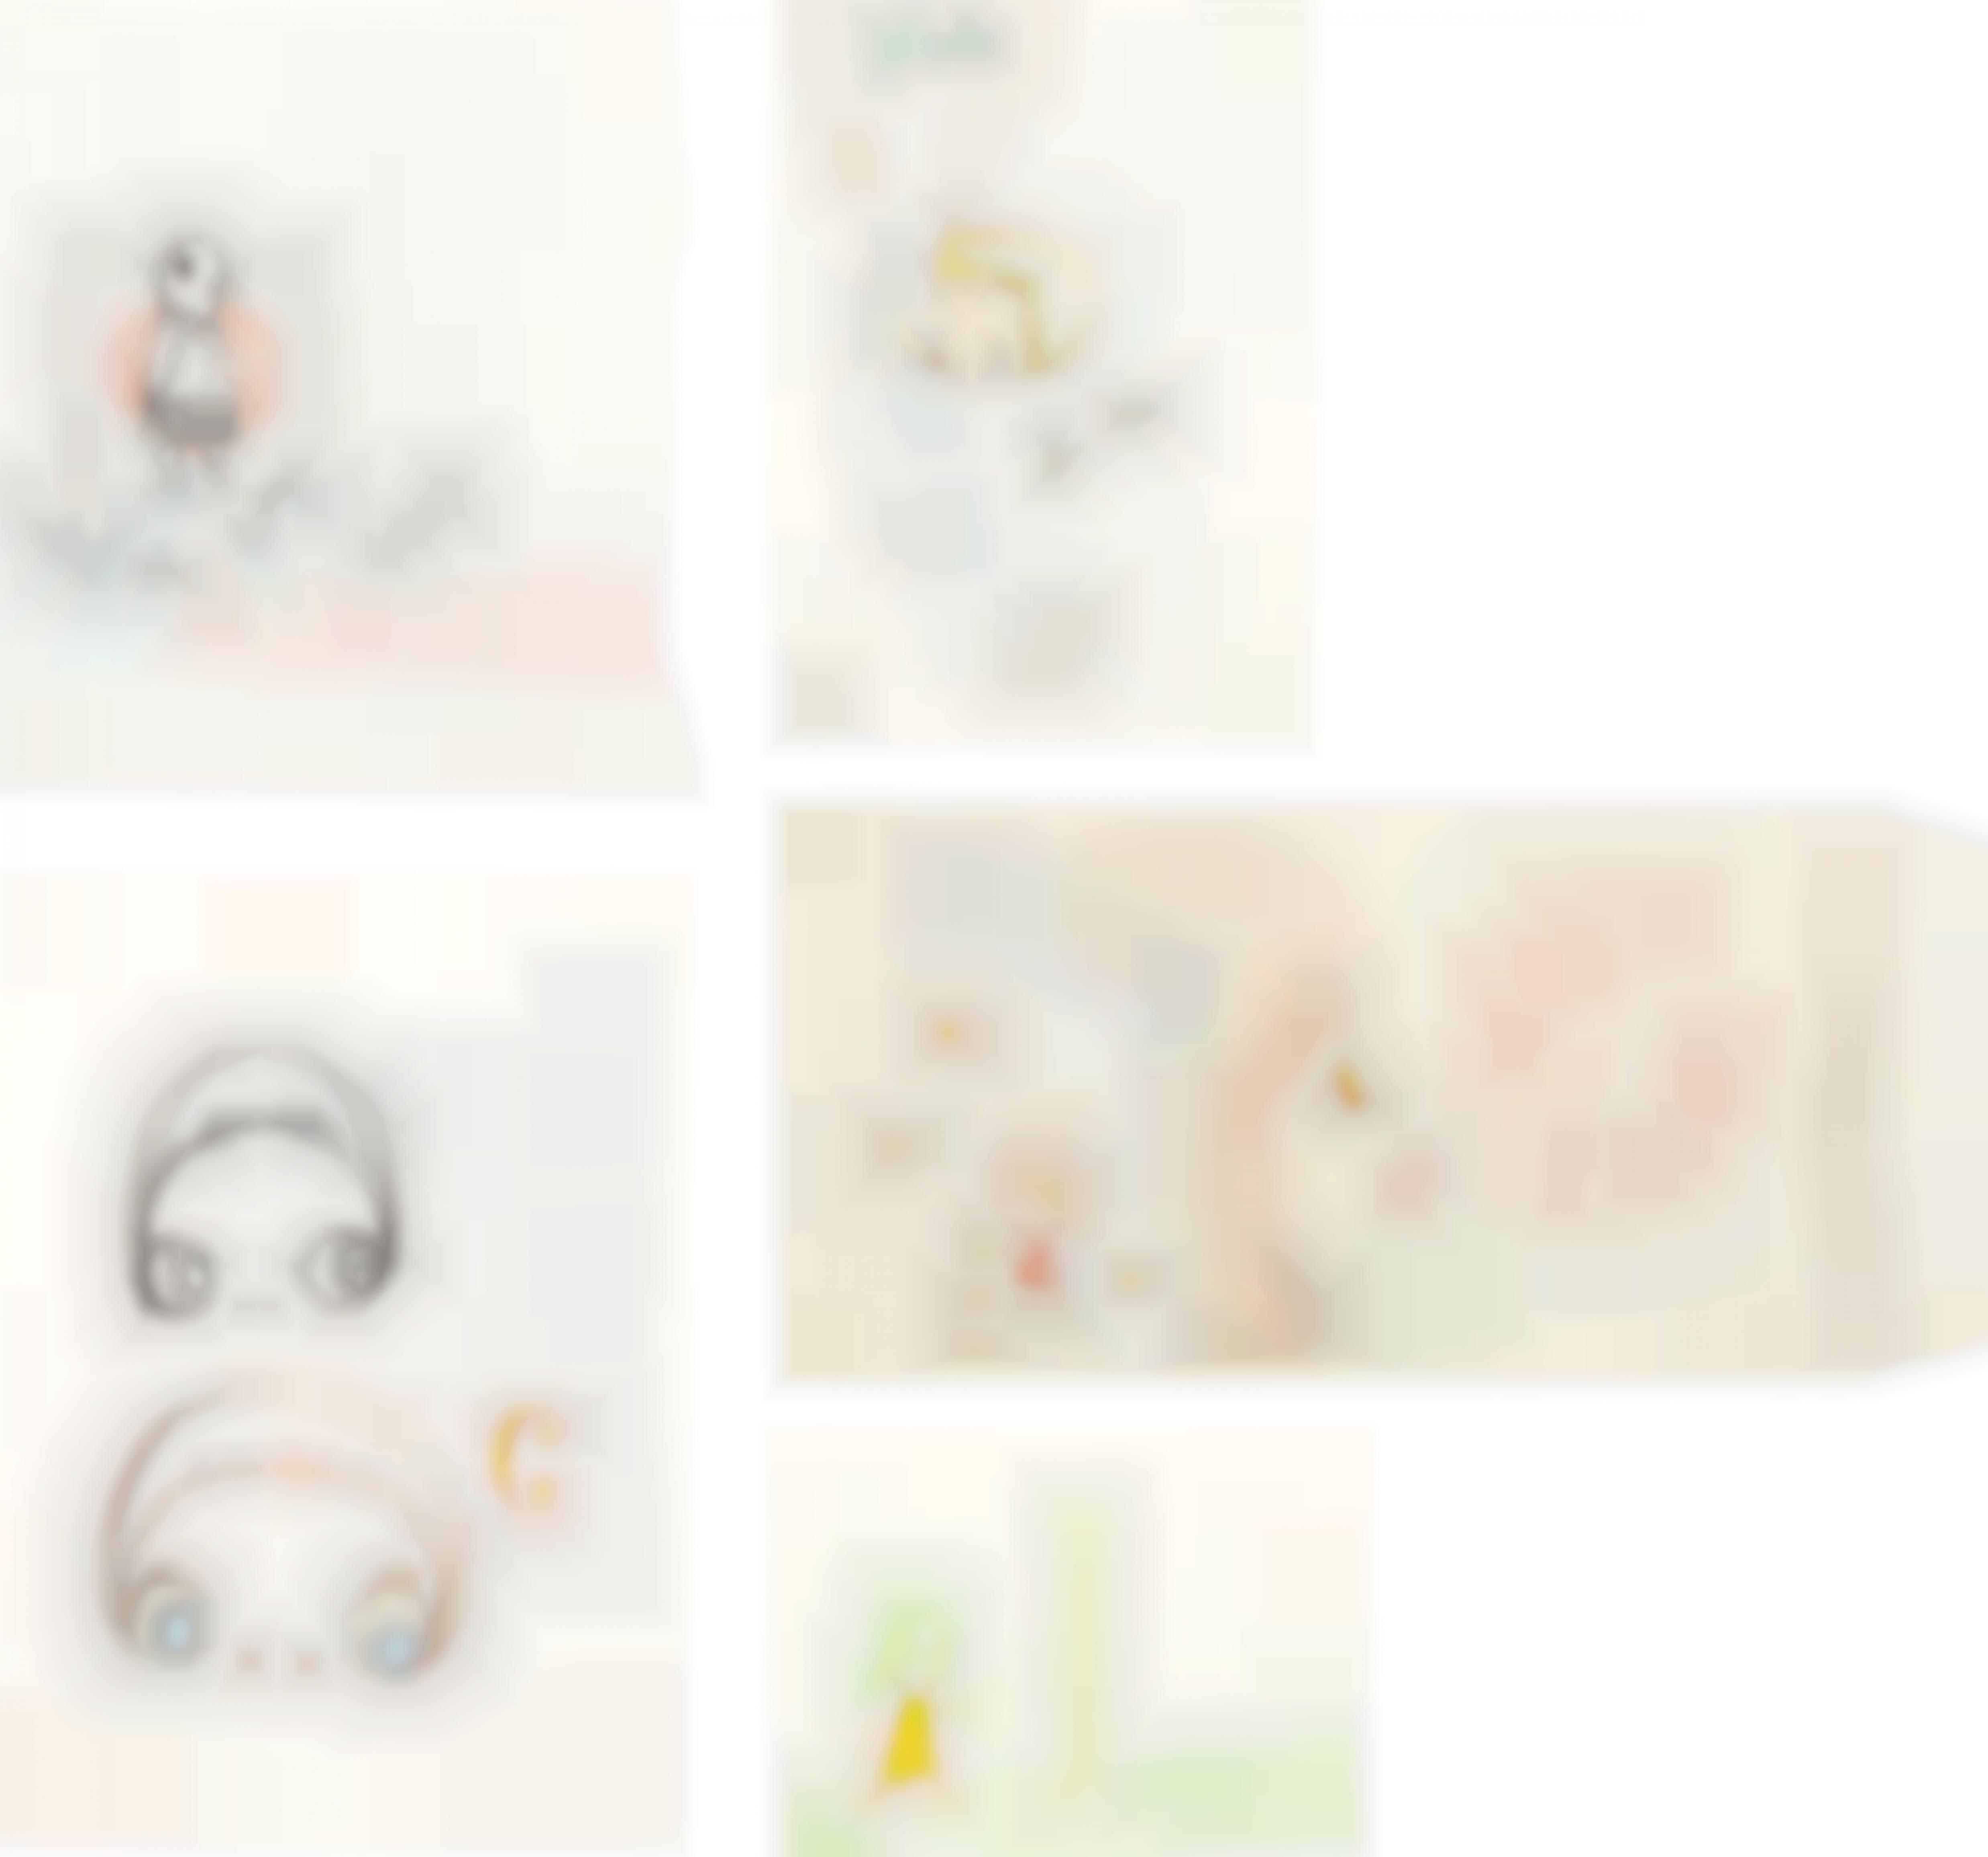 Yoshitomo Nara-Five Works: (i) Untitled (ii) Untitled (Two Little Faces) (iii) Words (iv) Leben Schaum (Live Foam) (v) No More-2002